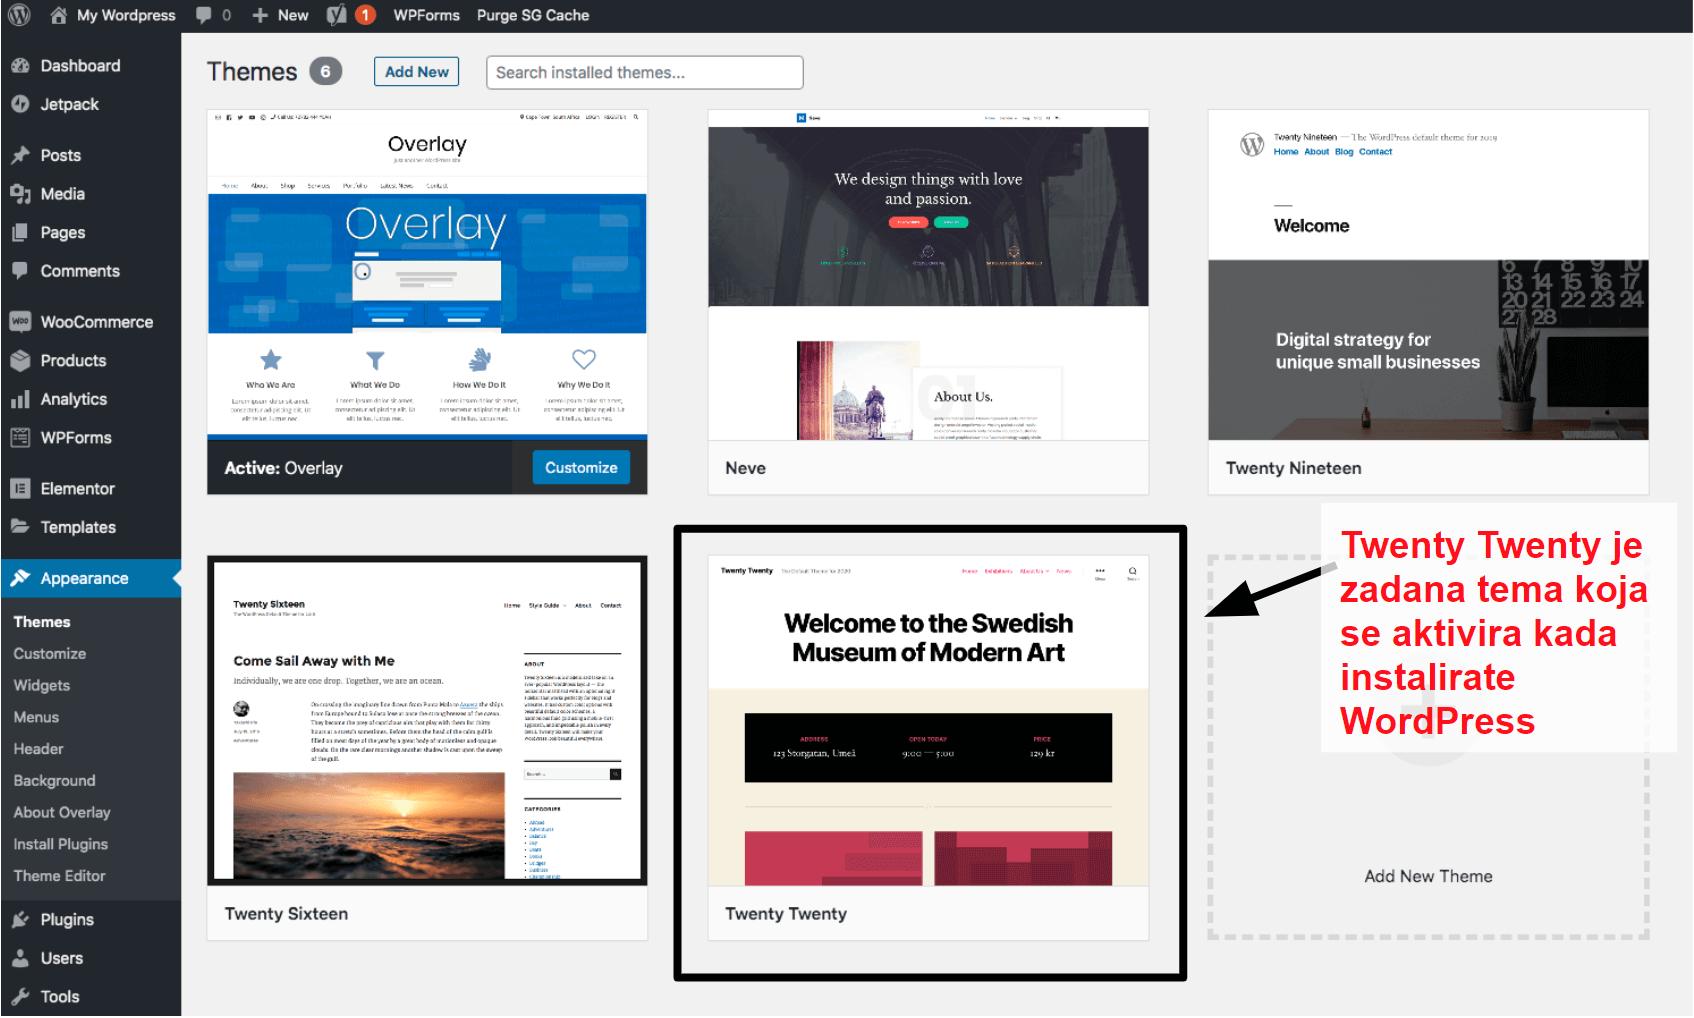 WordPress themes panel HR17